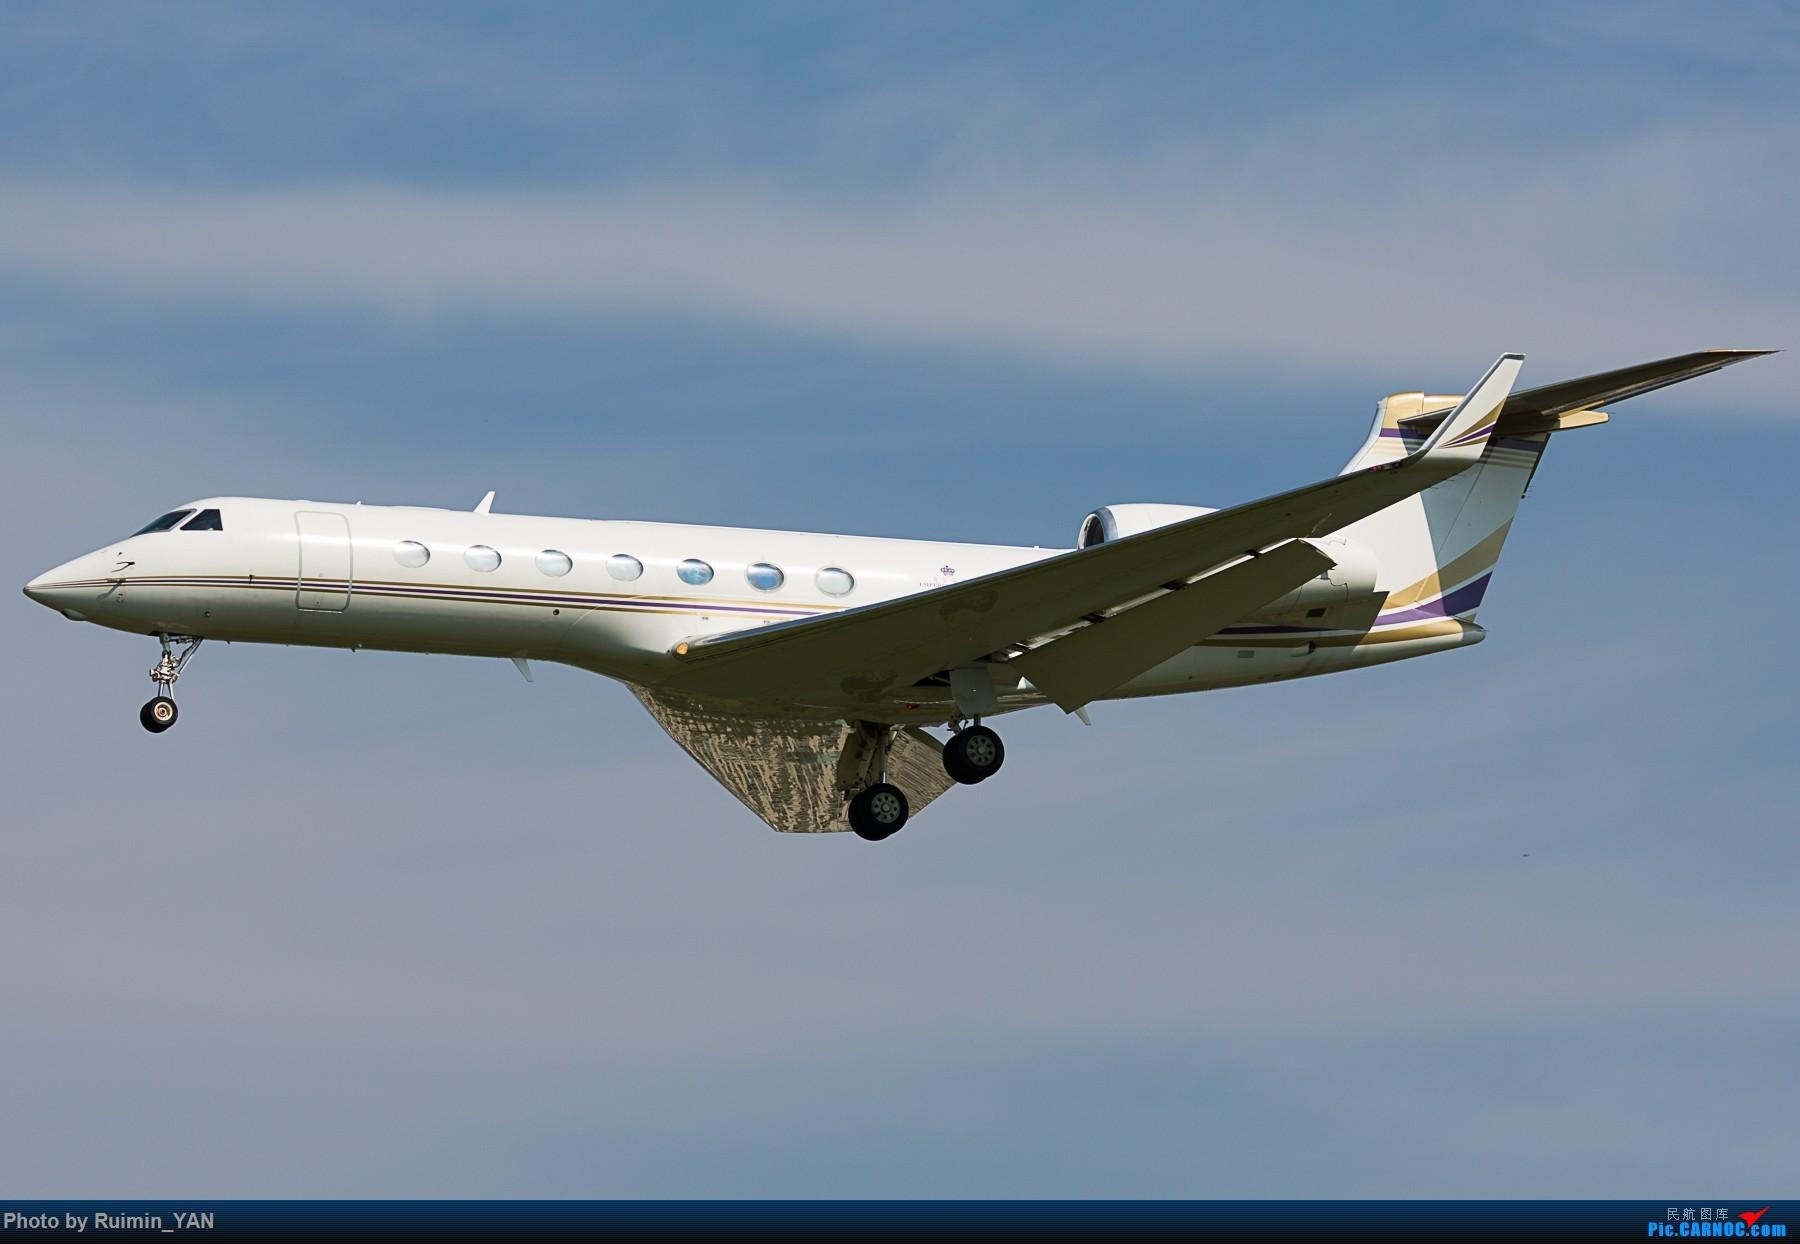 【PEK】【公务机】Emperor Express, Gulfstream Aerospace G200, N88AY GULFSTREAM G200 N88AY 中国北京首都国际机场